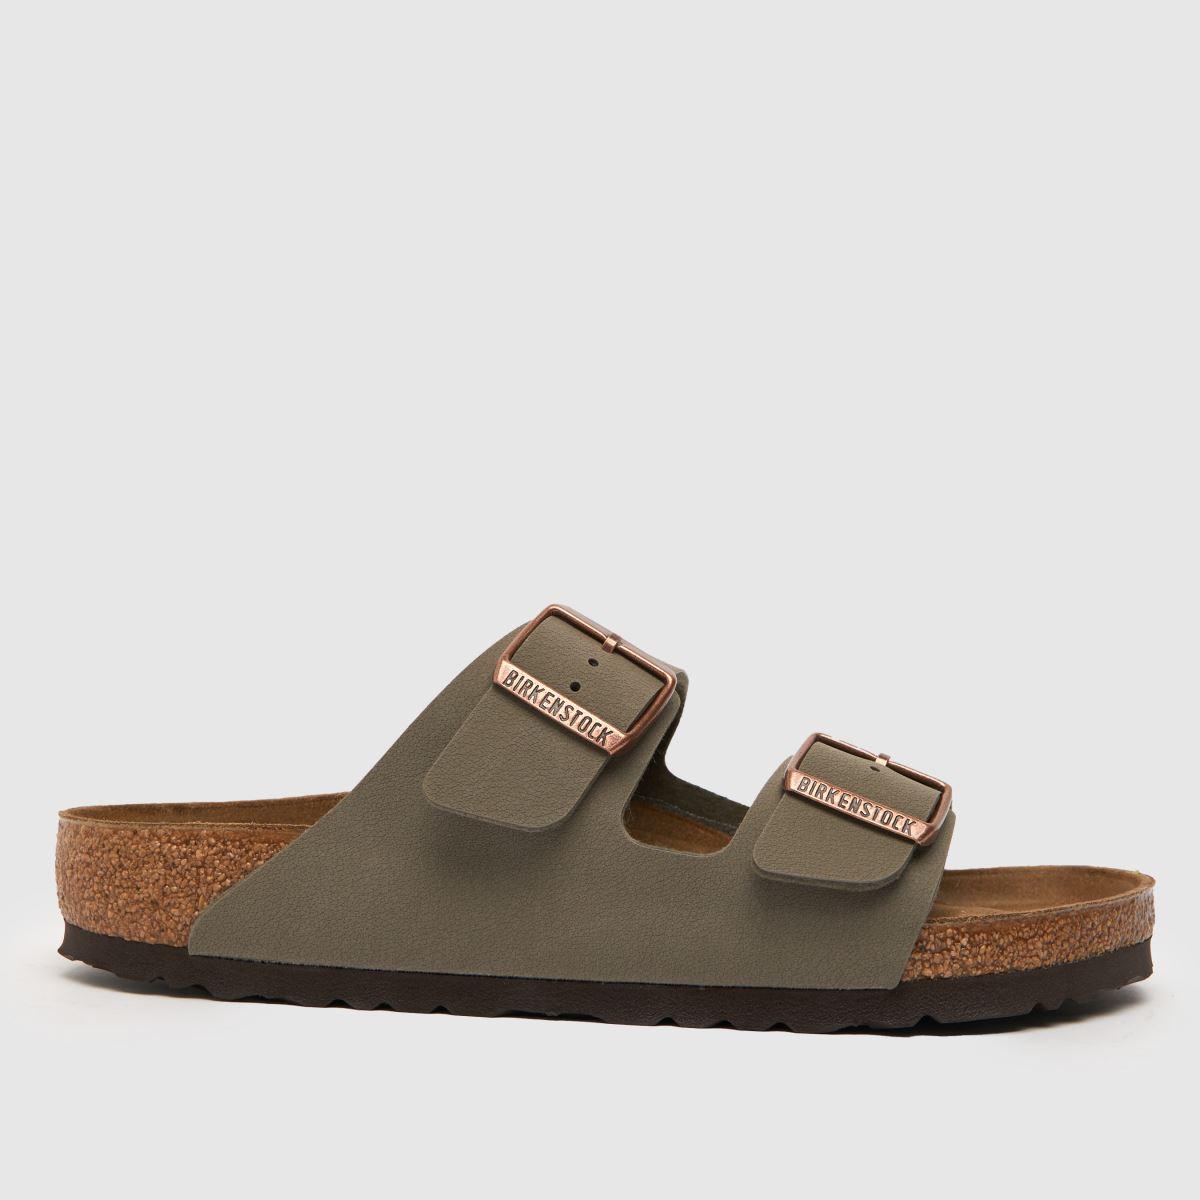 birkenstock stone birk gizeh shiny snake sandals